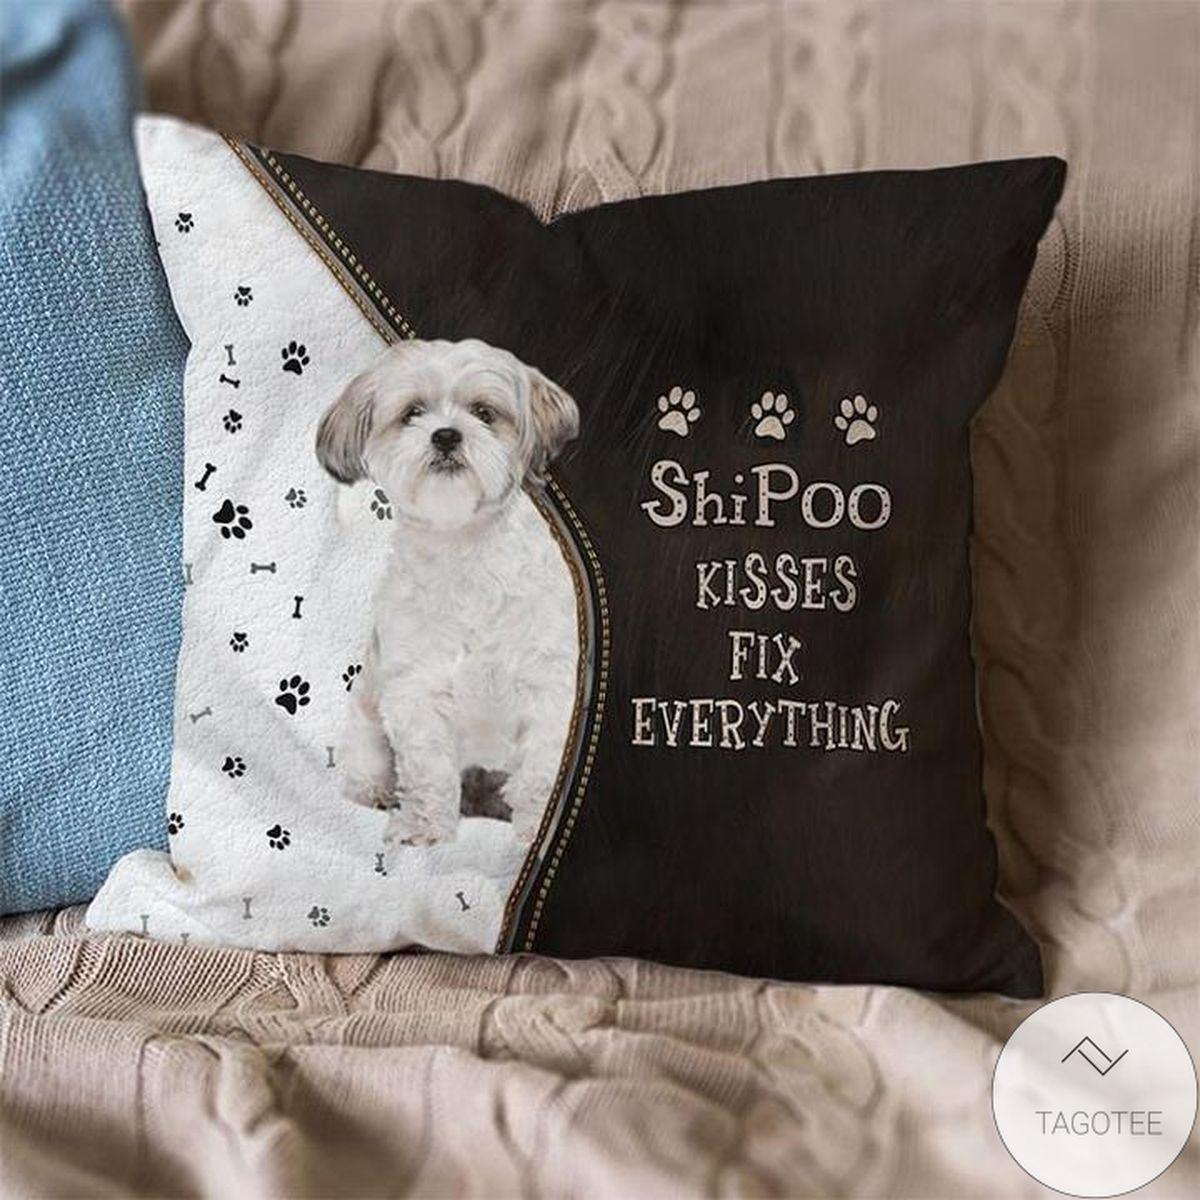 Clothing ShiPoo Kisses Fix Everything Pillowcase